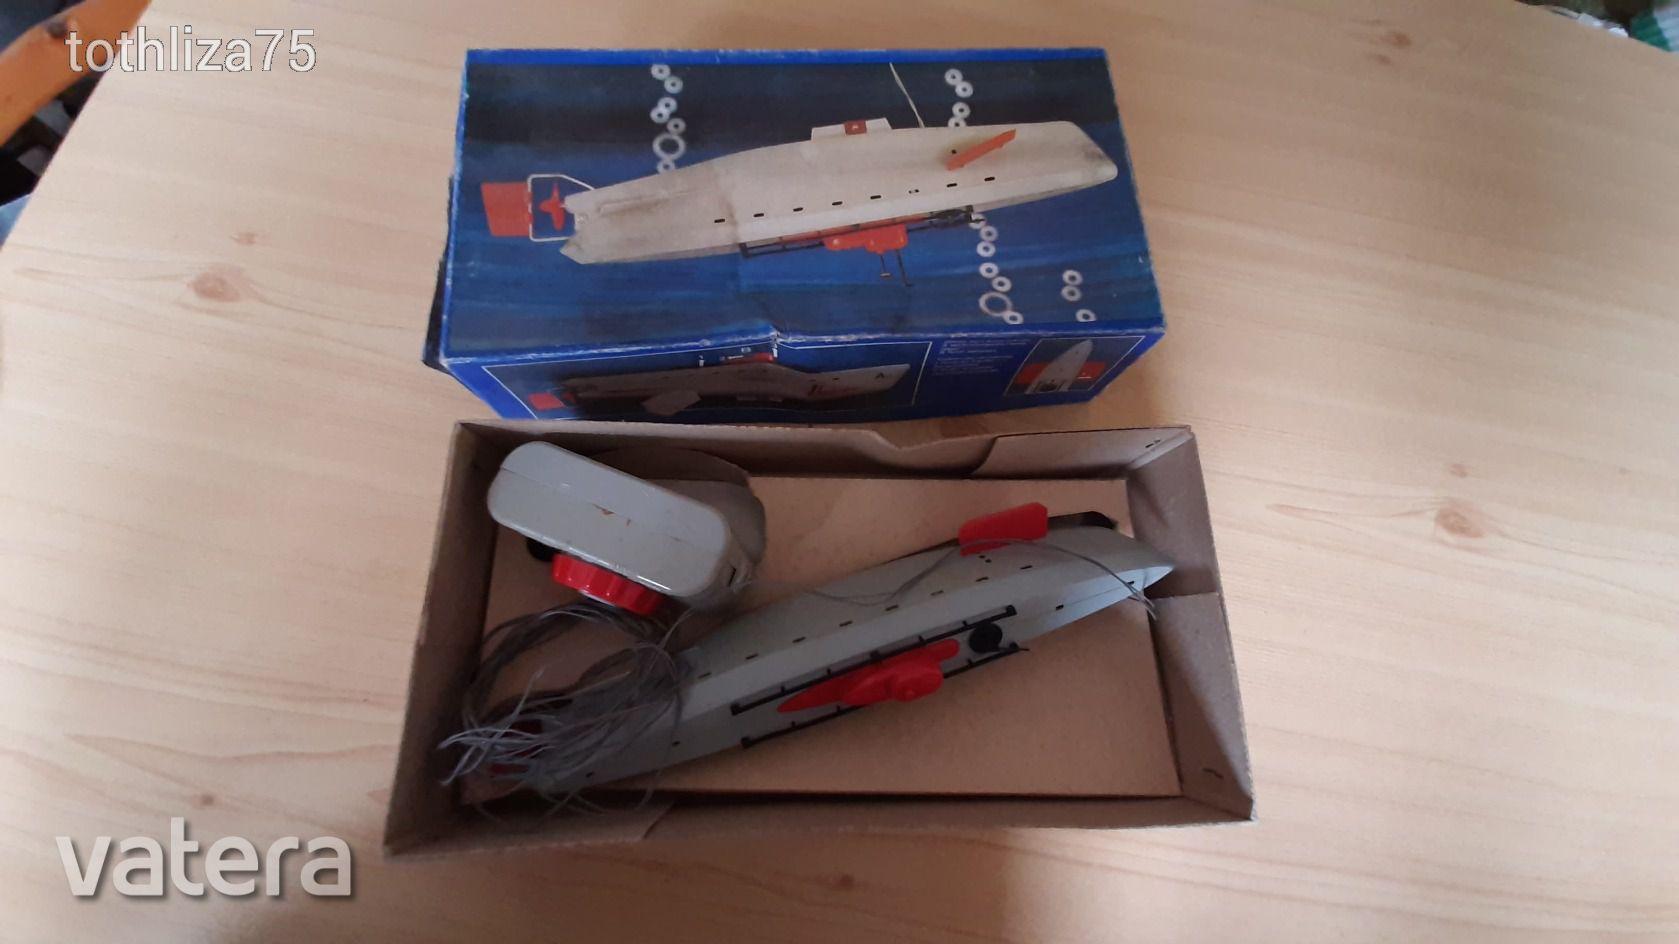 anker-dobozos-drotos-tavos-tengeralattjaro-459a_1_big.jpg